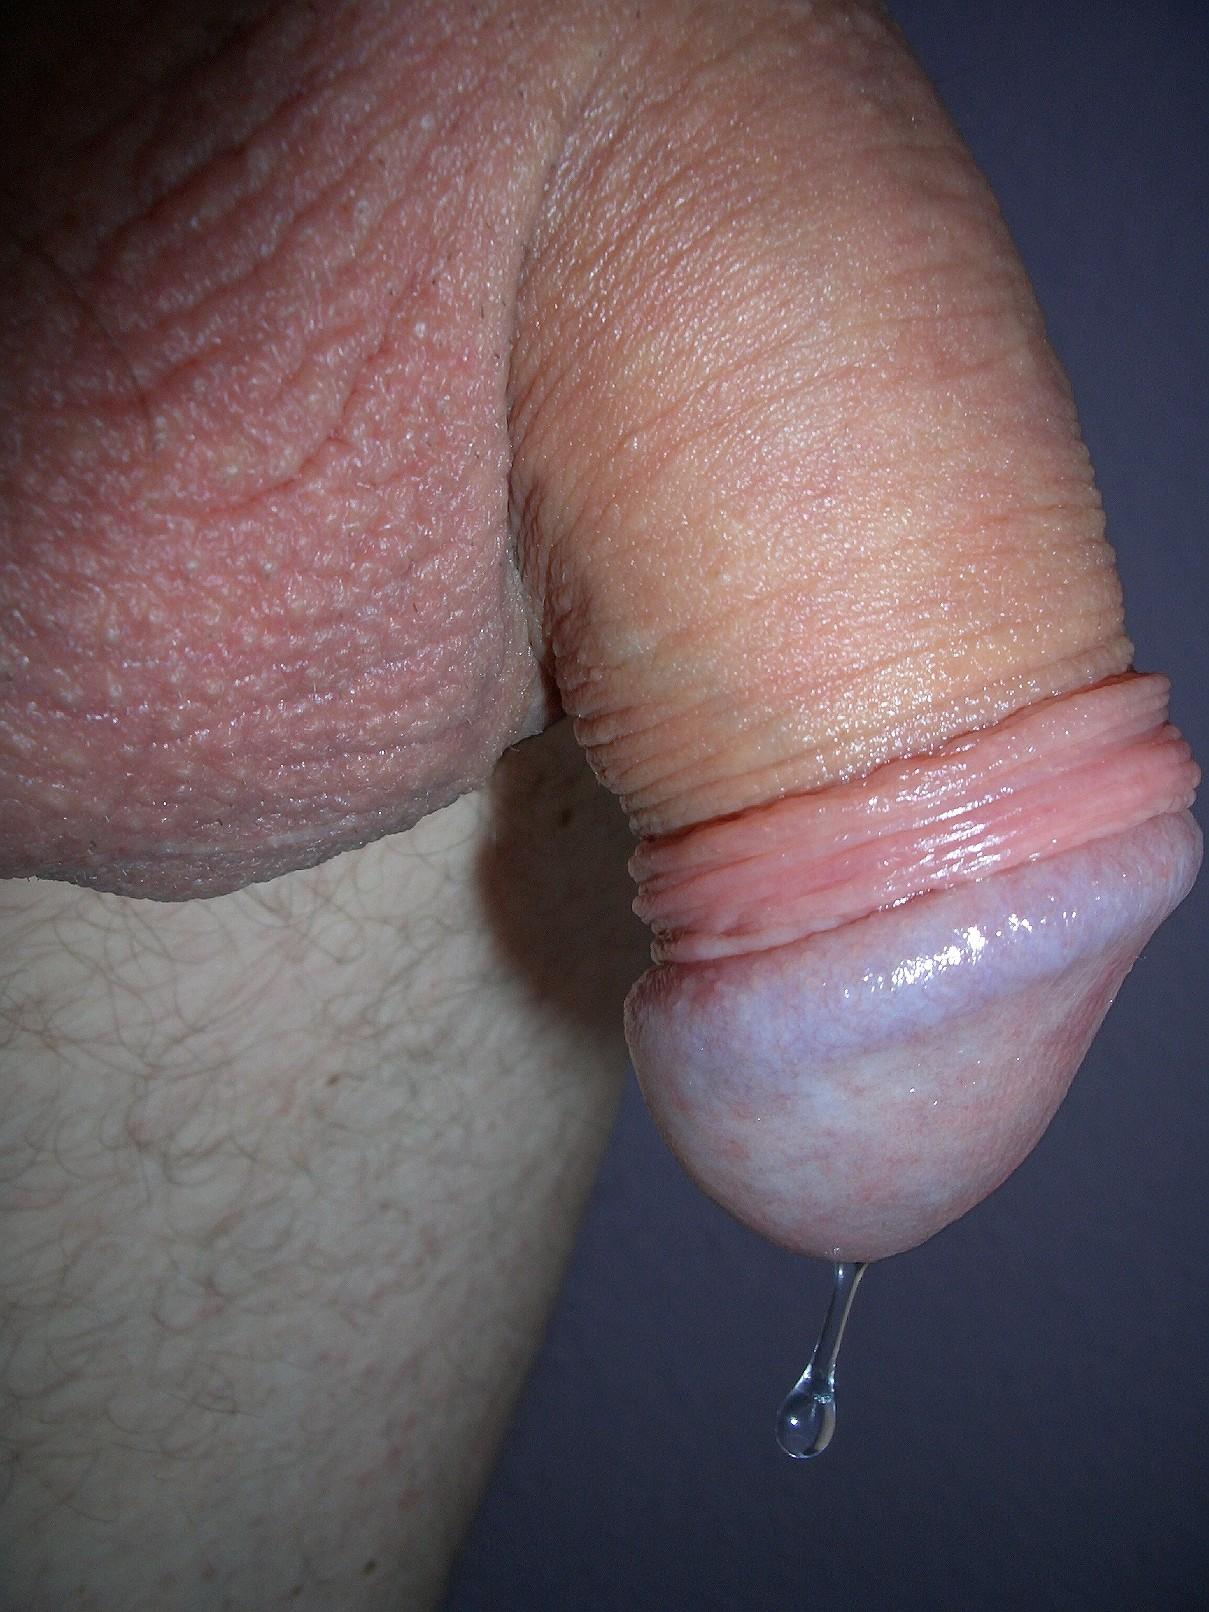 sissy dick pics